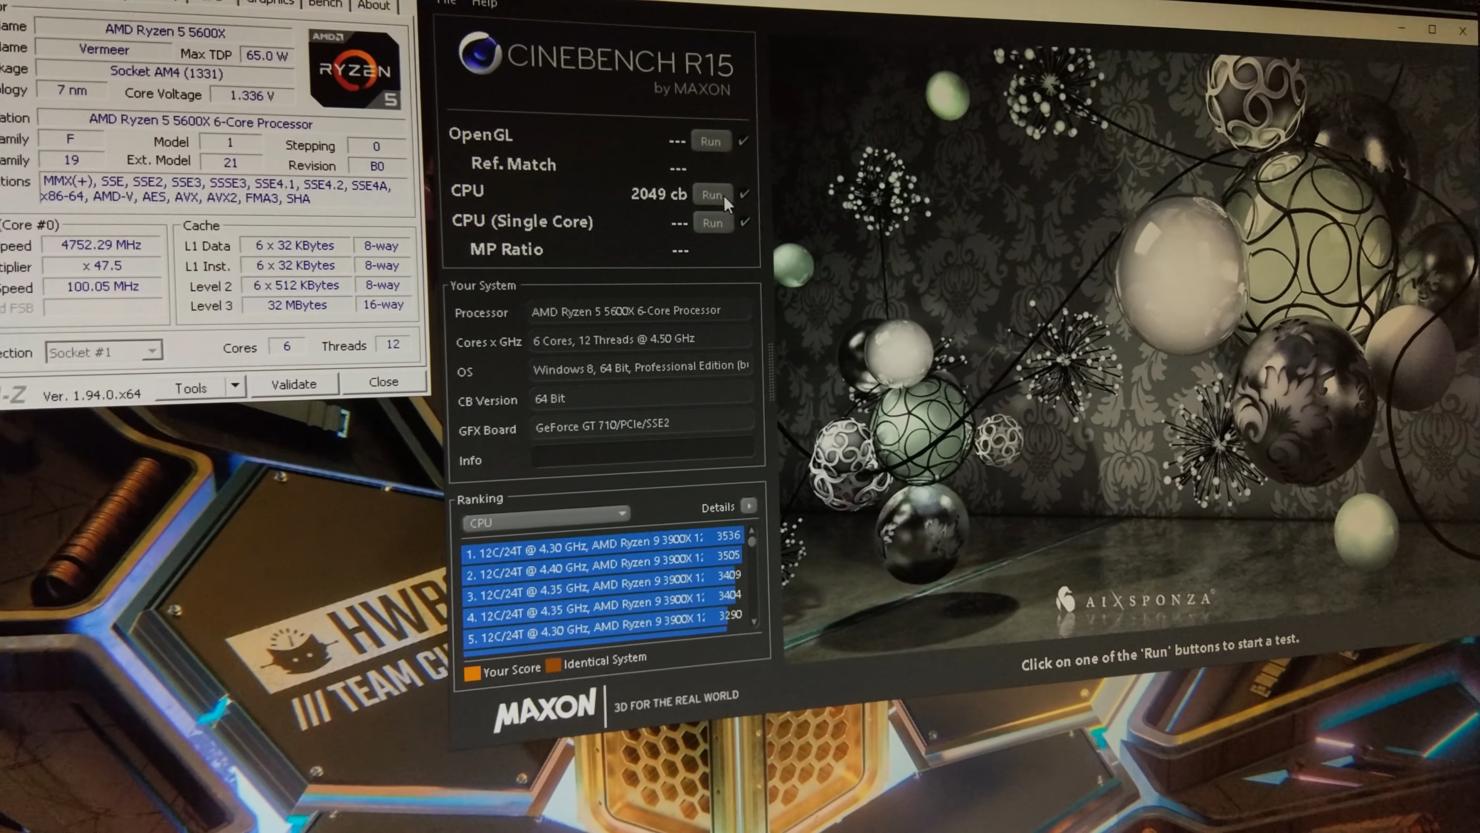 amd-ryzen-5-5600x-6-core-zen-3-cpu-benchmarks_4-75-ghz_2